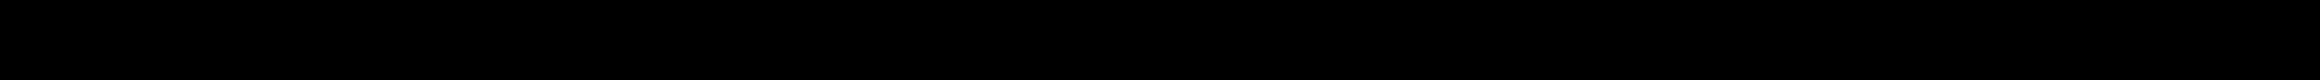 DENSO S47, 12290-RSH-003, 12290-RSH-004, 98079-561-5V Bougie